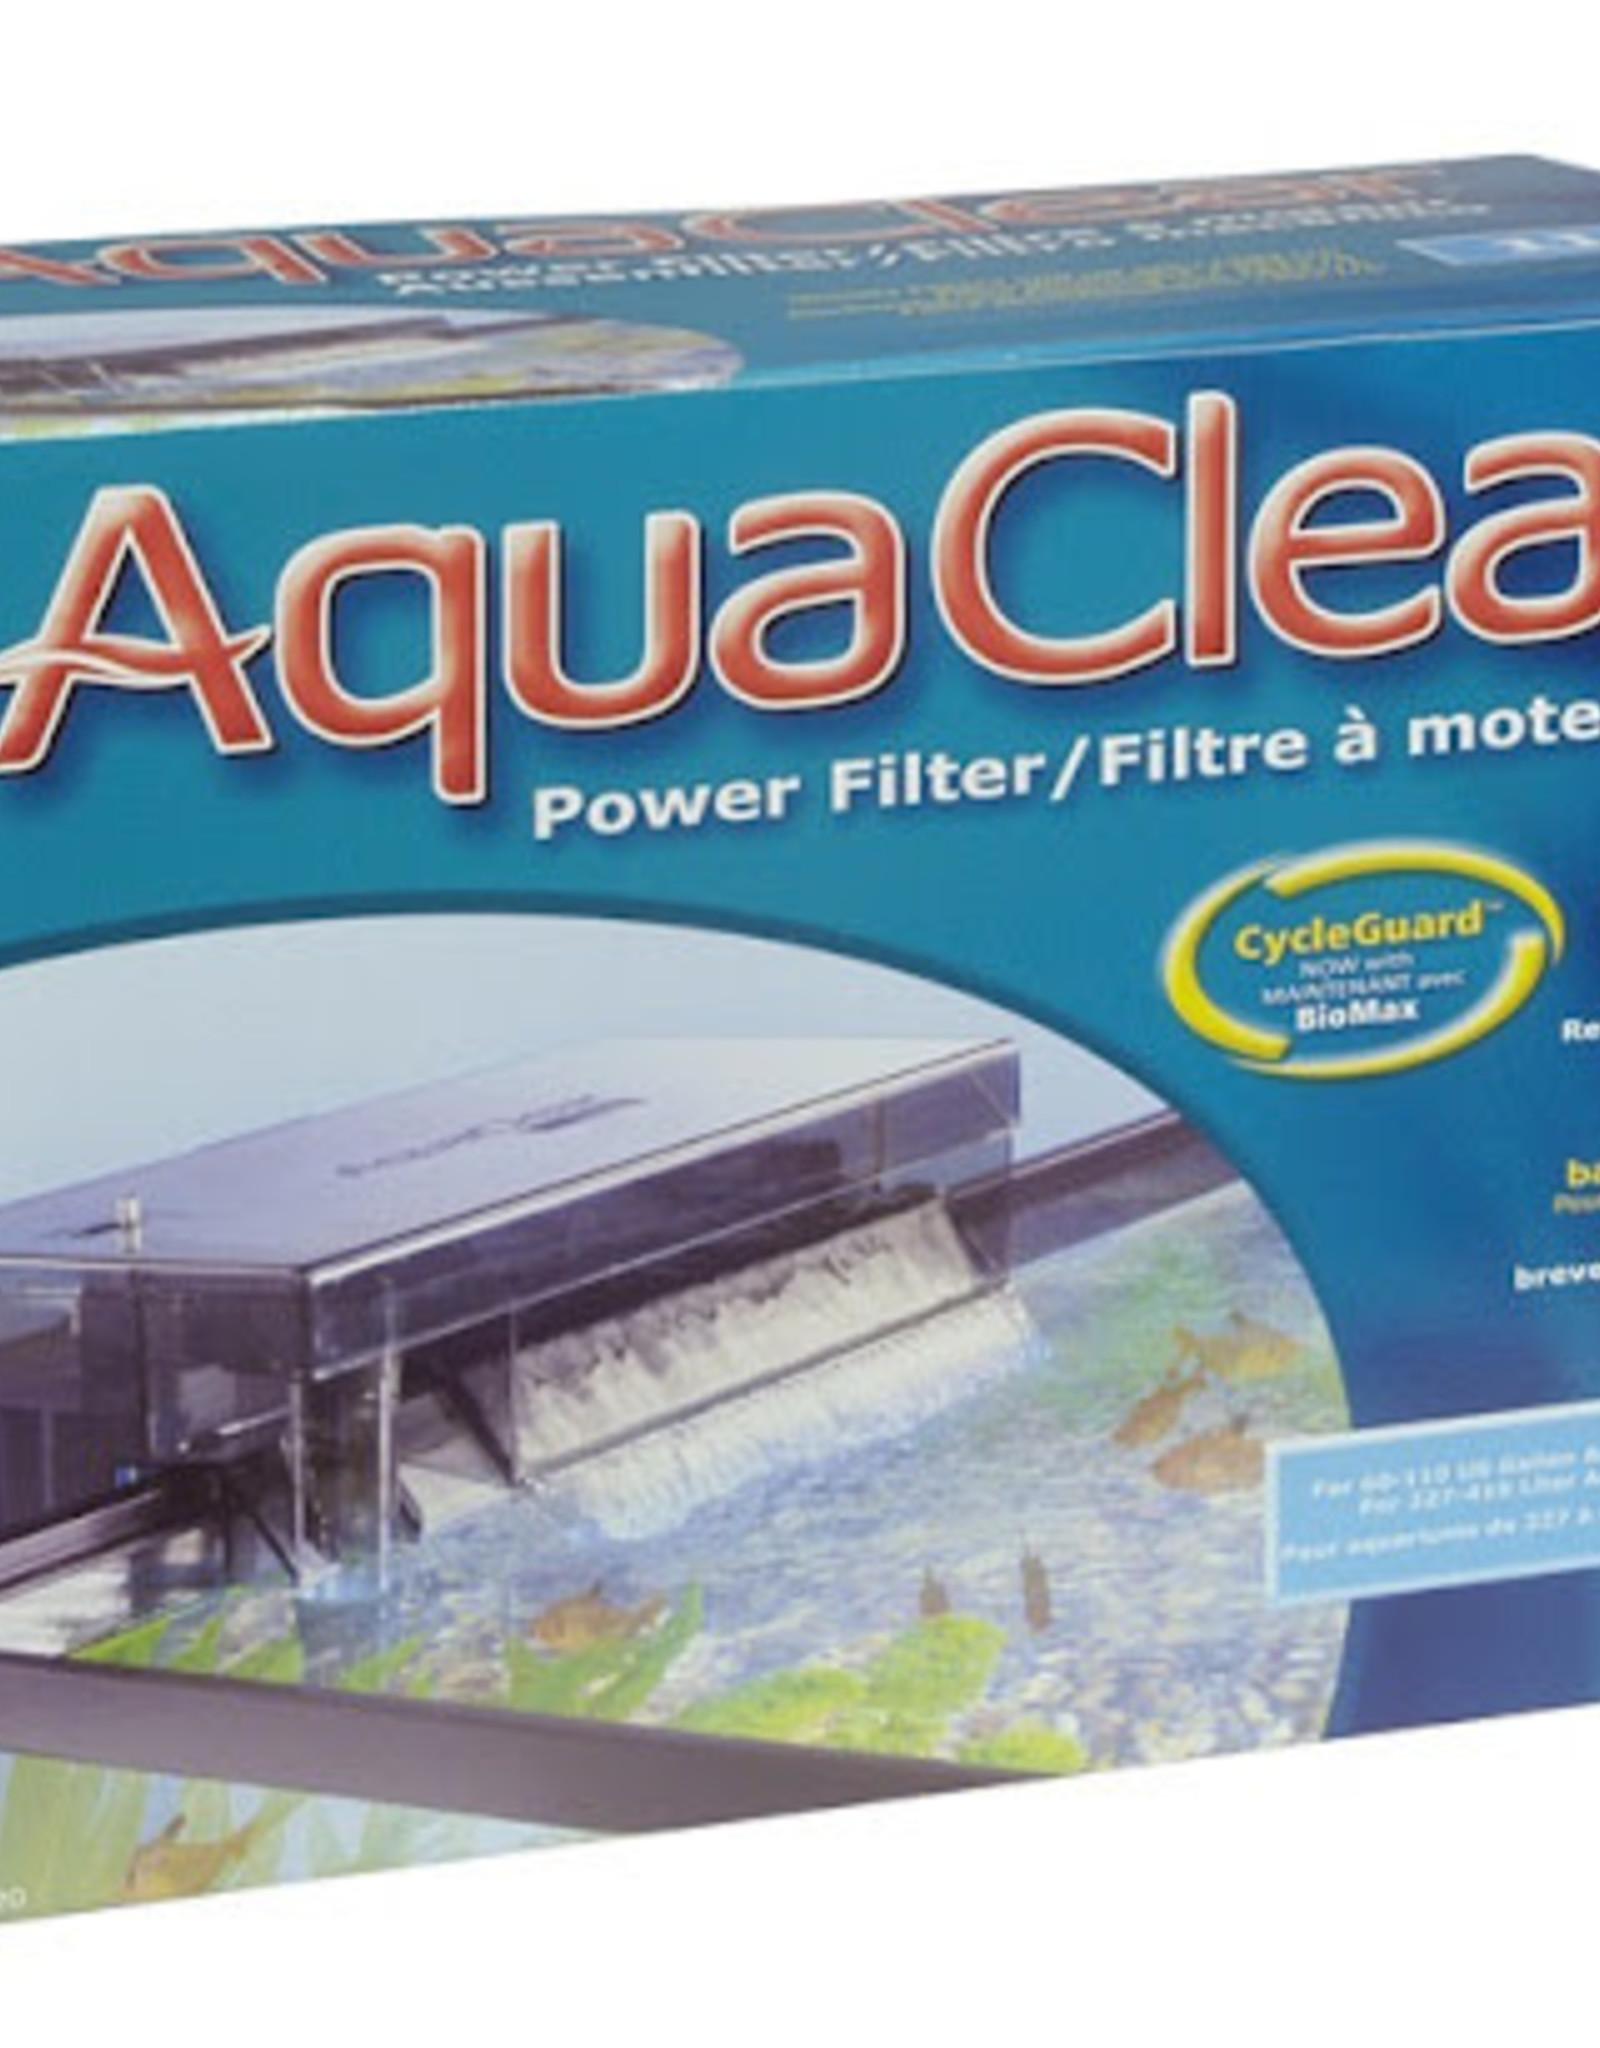 AQUA CLEAR AquaClear 110 Power Filter, cETLus Listed (Inc. A622, A623 & A1374)